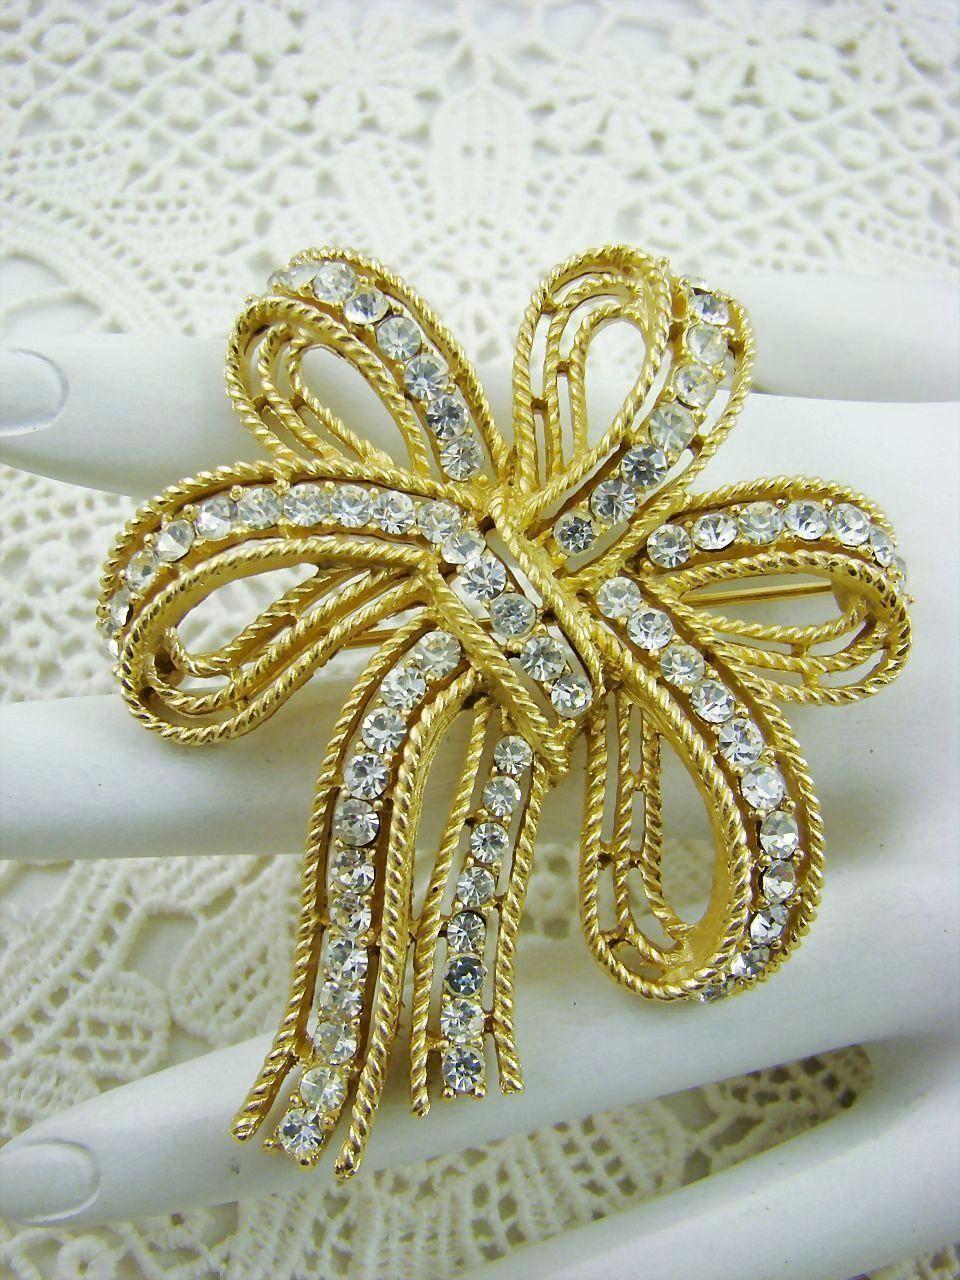 Exquisite Crown Trifari Sparkling Rhinestone Bow Brooch